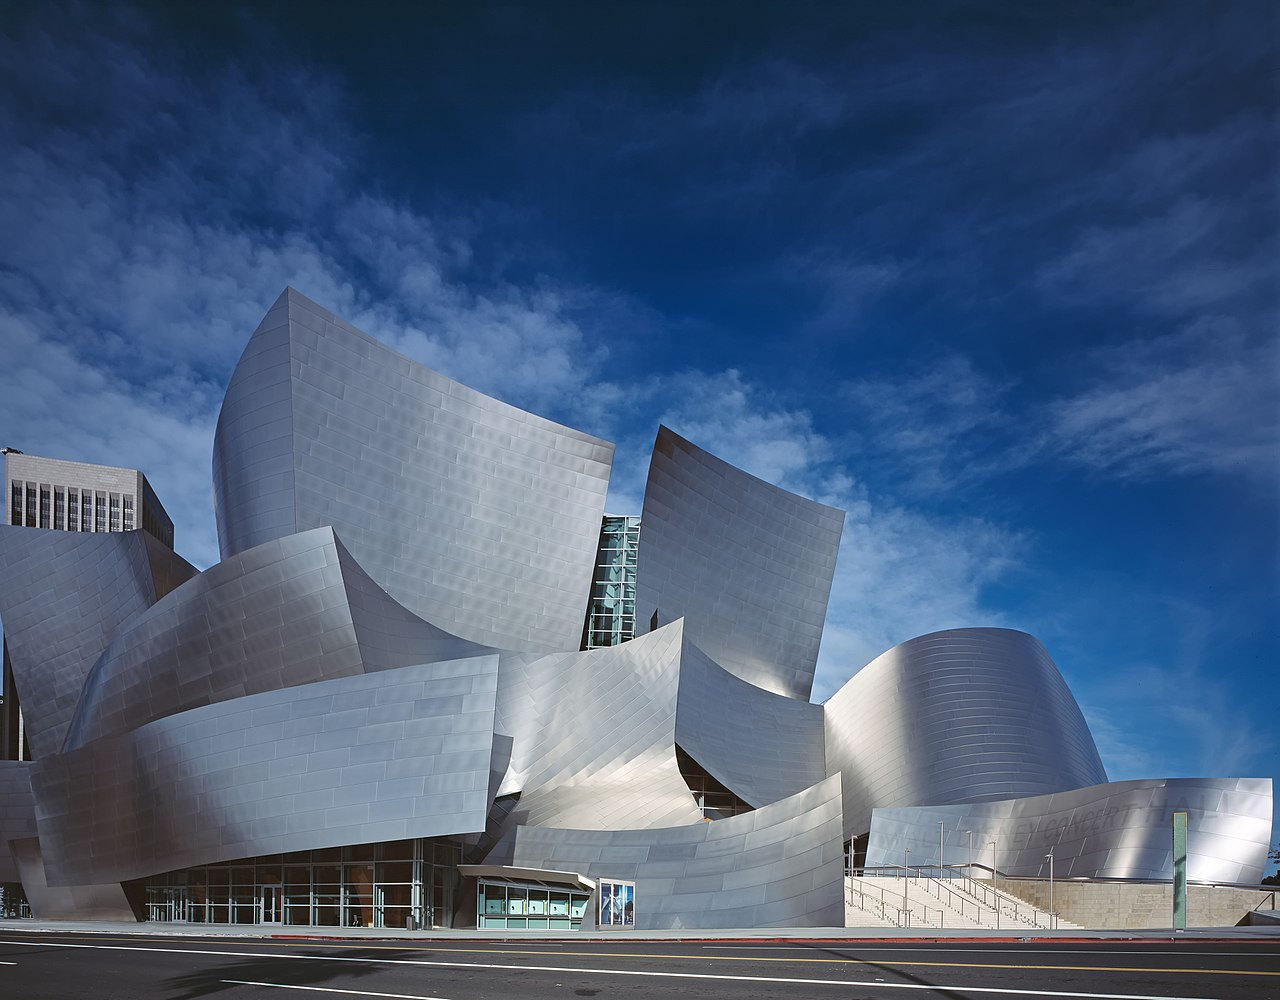 Architect Spotlight: The Wondrous Works of Frank Gehry | NanaWall